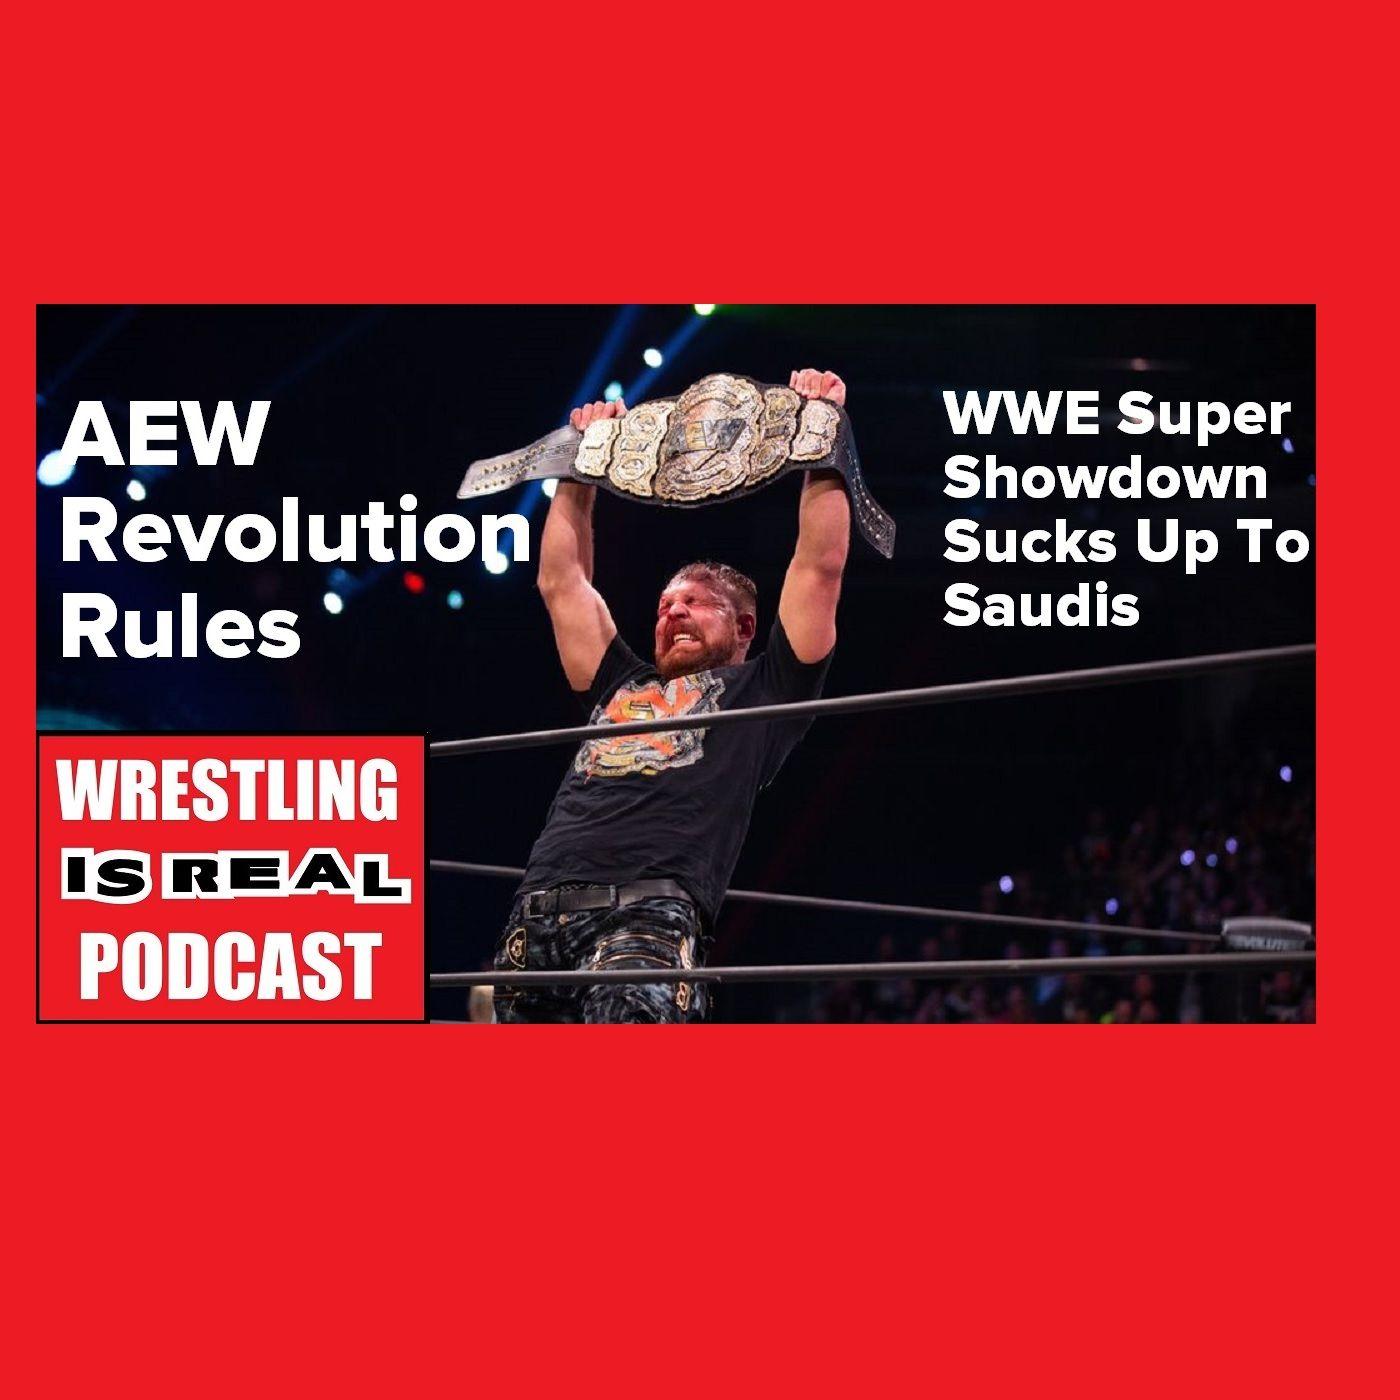 AEW Revolution Rules WWE Super Showdown Sucks Up To Saudis KOP030220-518